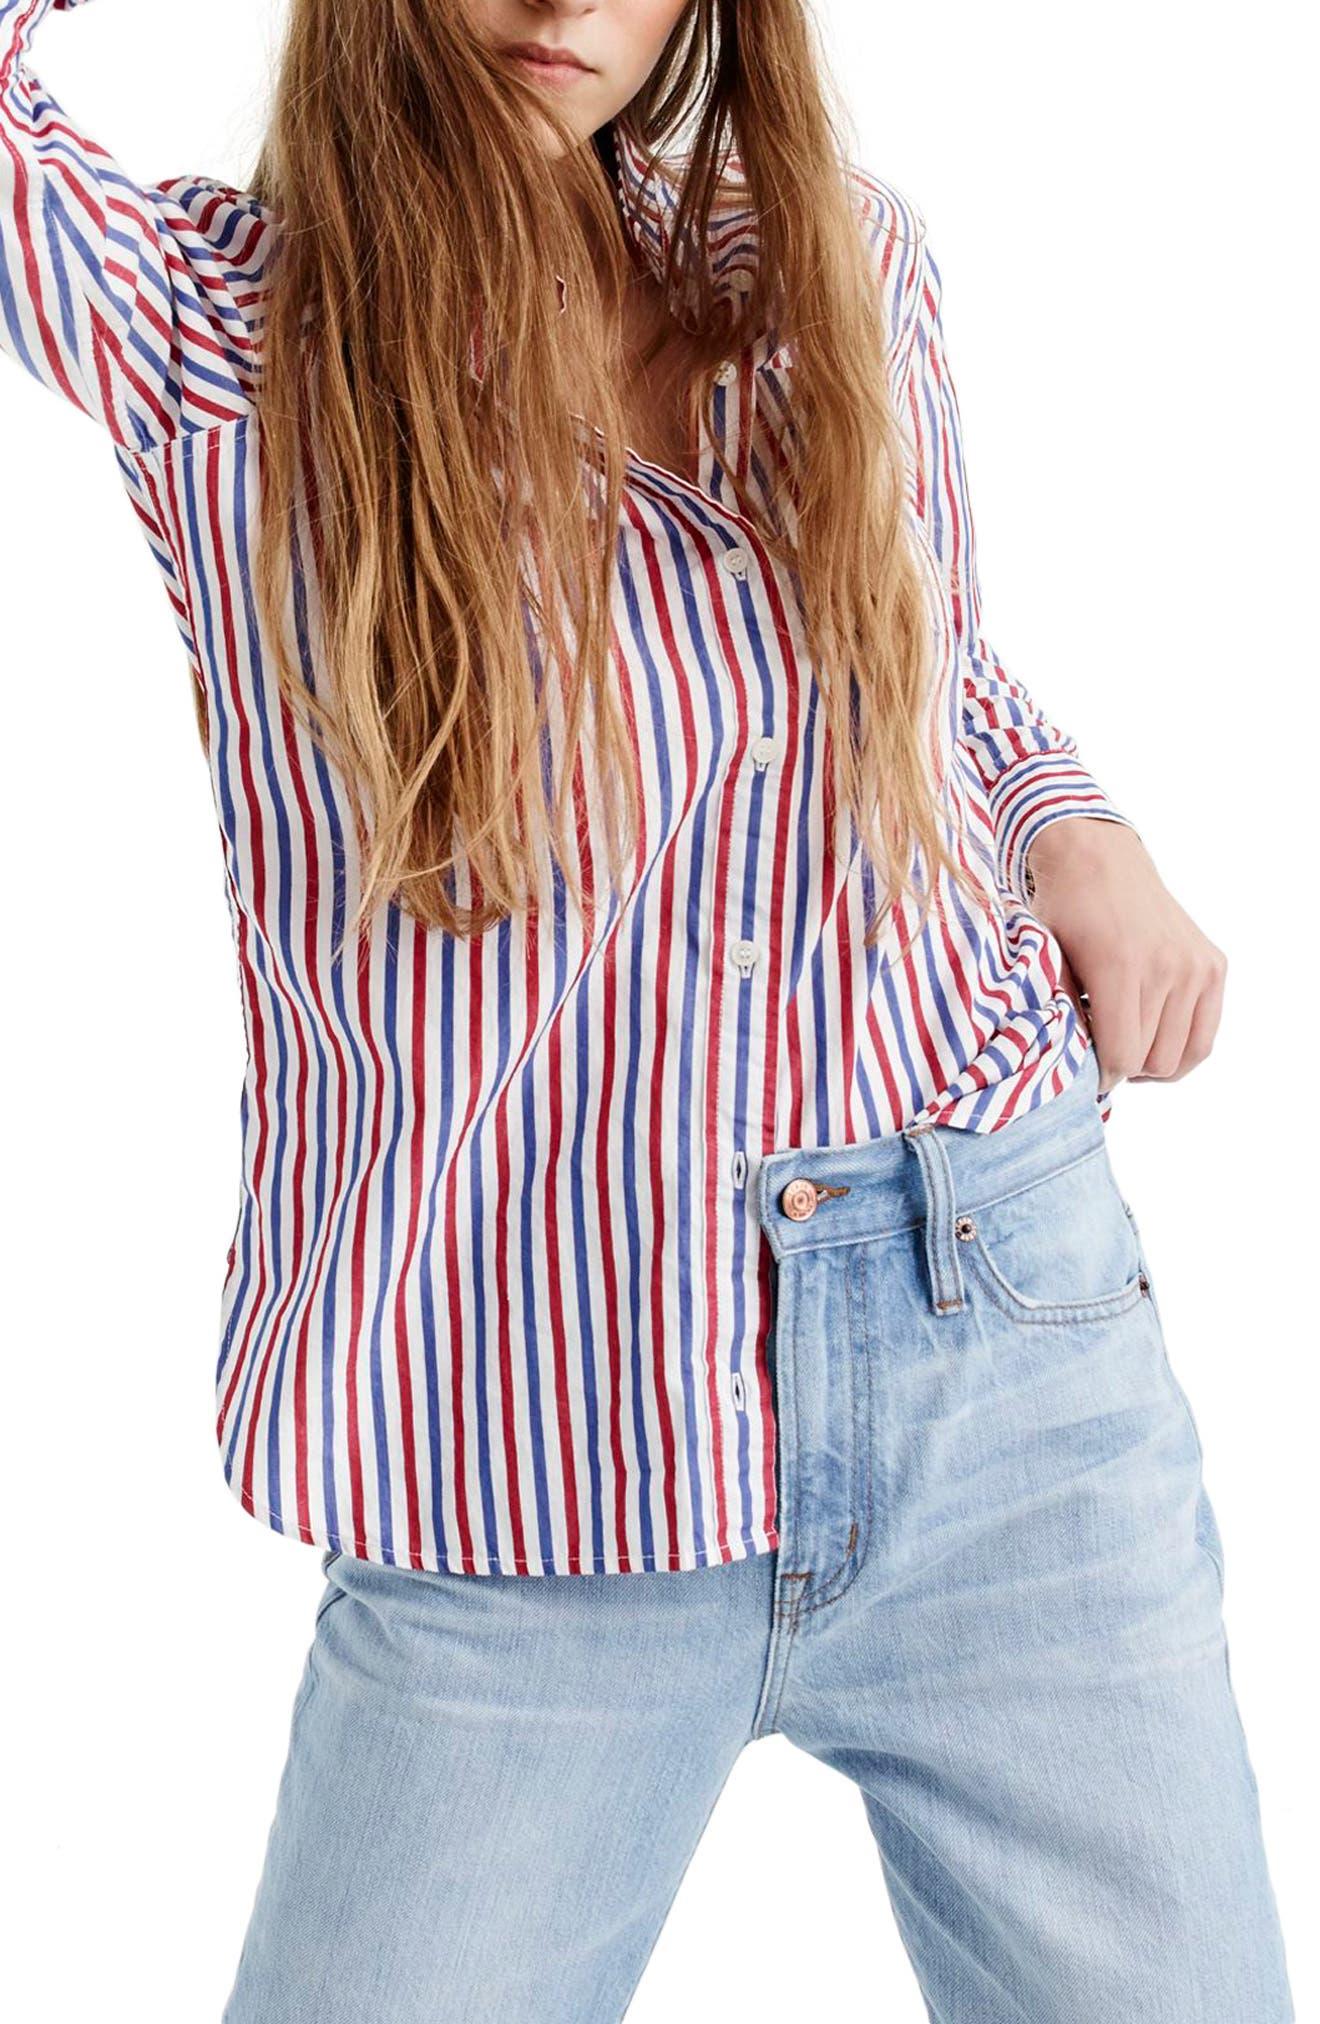 Alternate Image 1 Selected - J. Crew Stripe Boyfriend Shirt